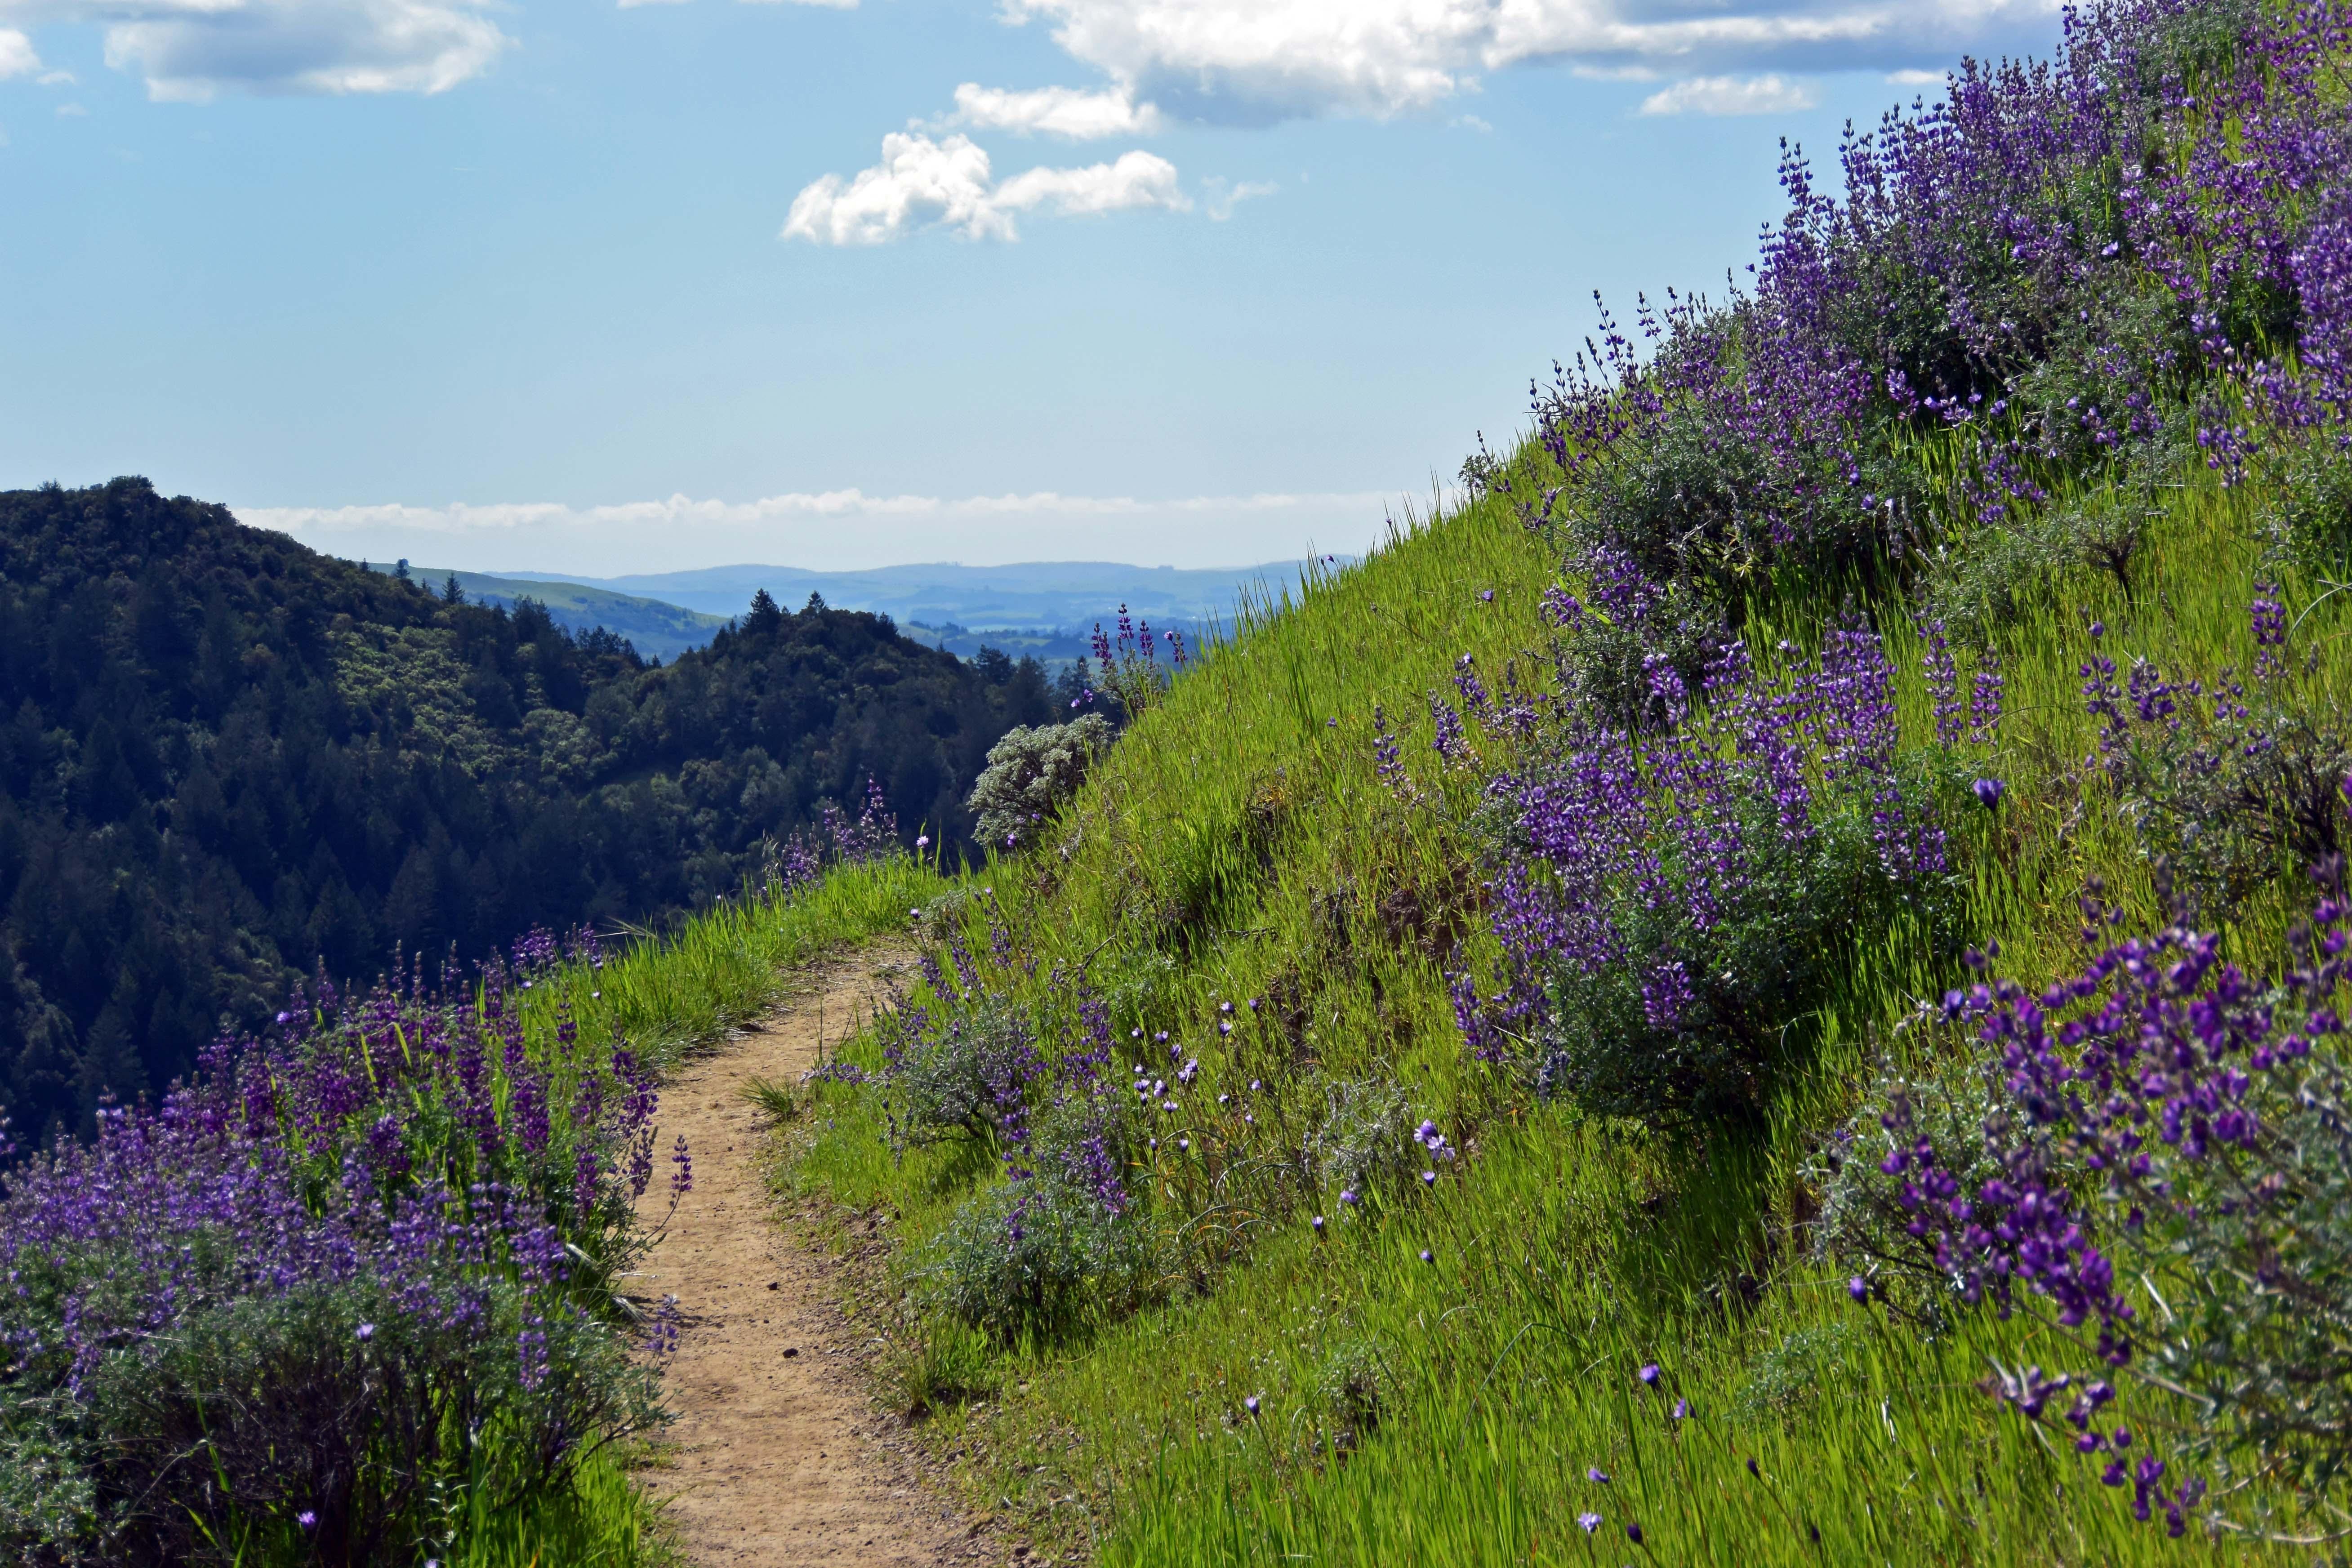 Sugarloaf Ridge State Park, Kenwood, Sonoma County, California